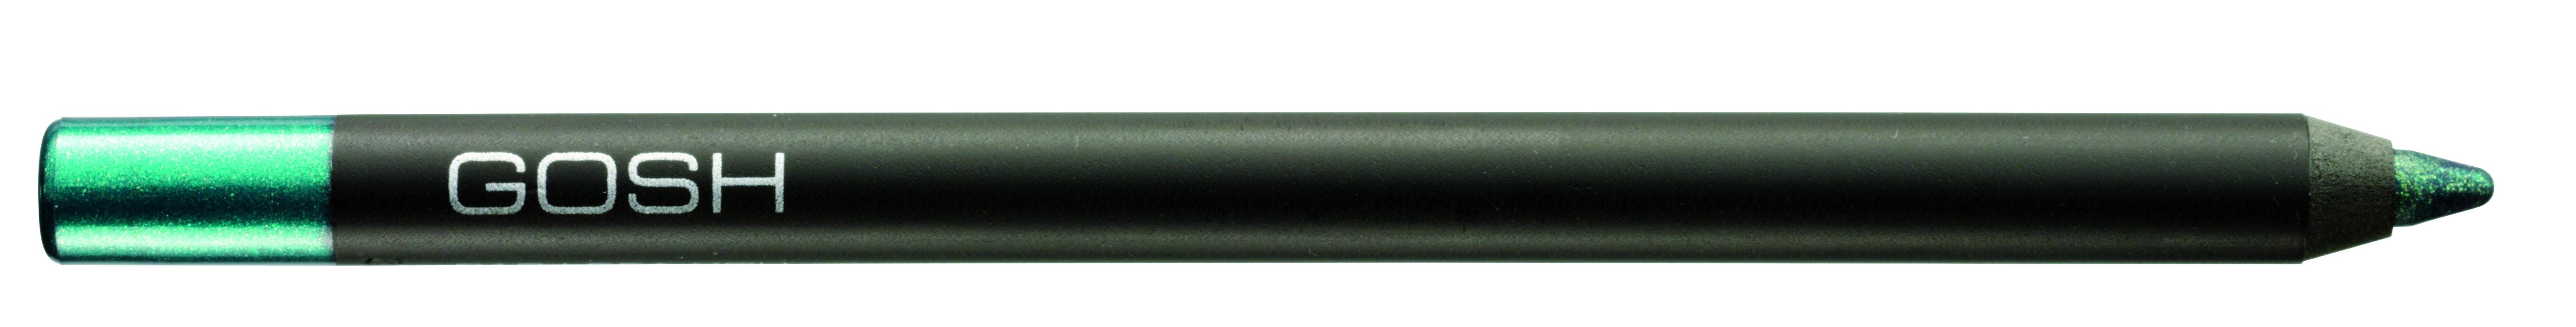 Карандаш для глаз Gosh Velvet Touch Eye Pencil Waterproof 018 - I Sea You по цене 331